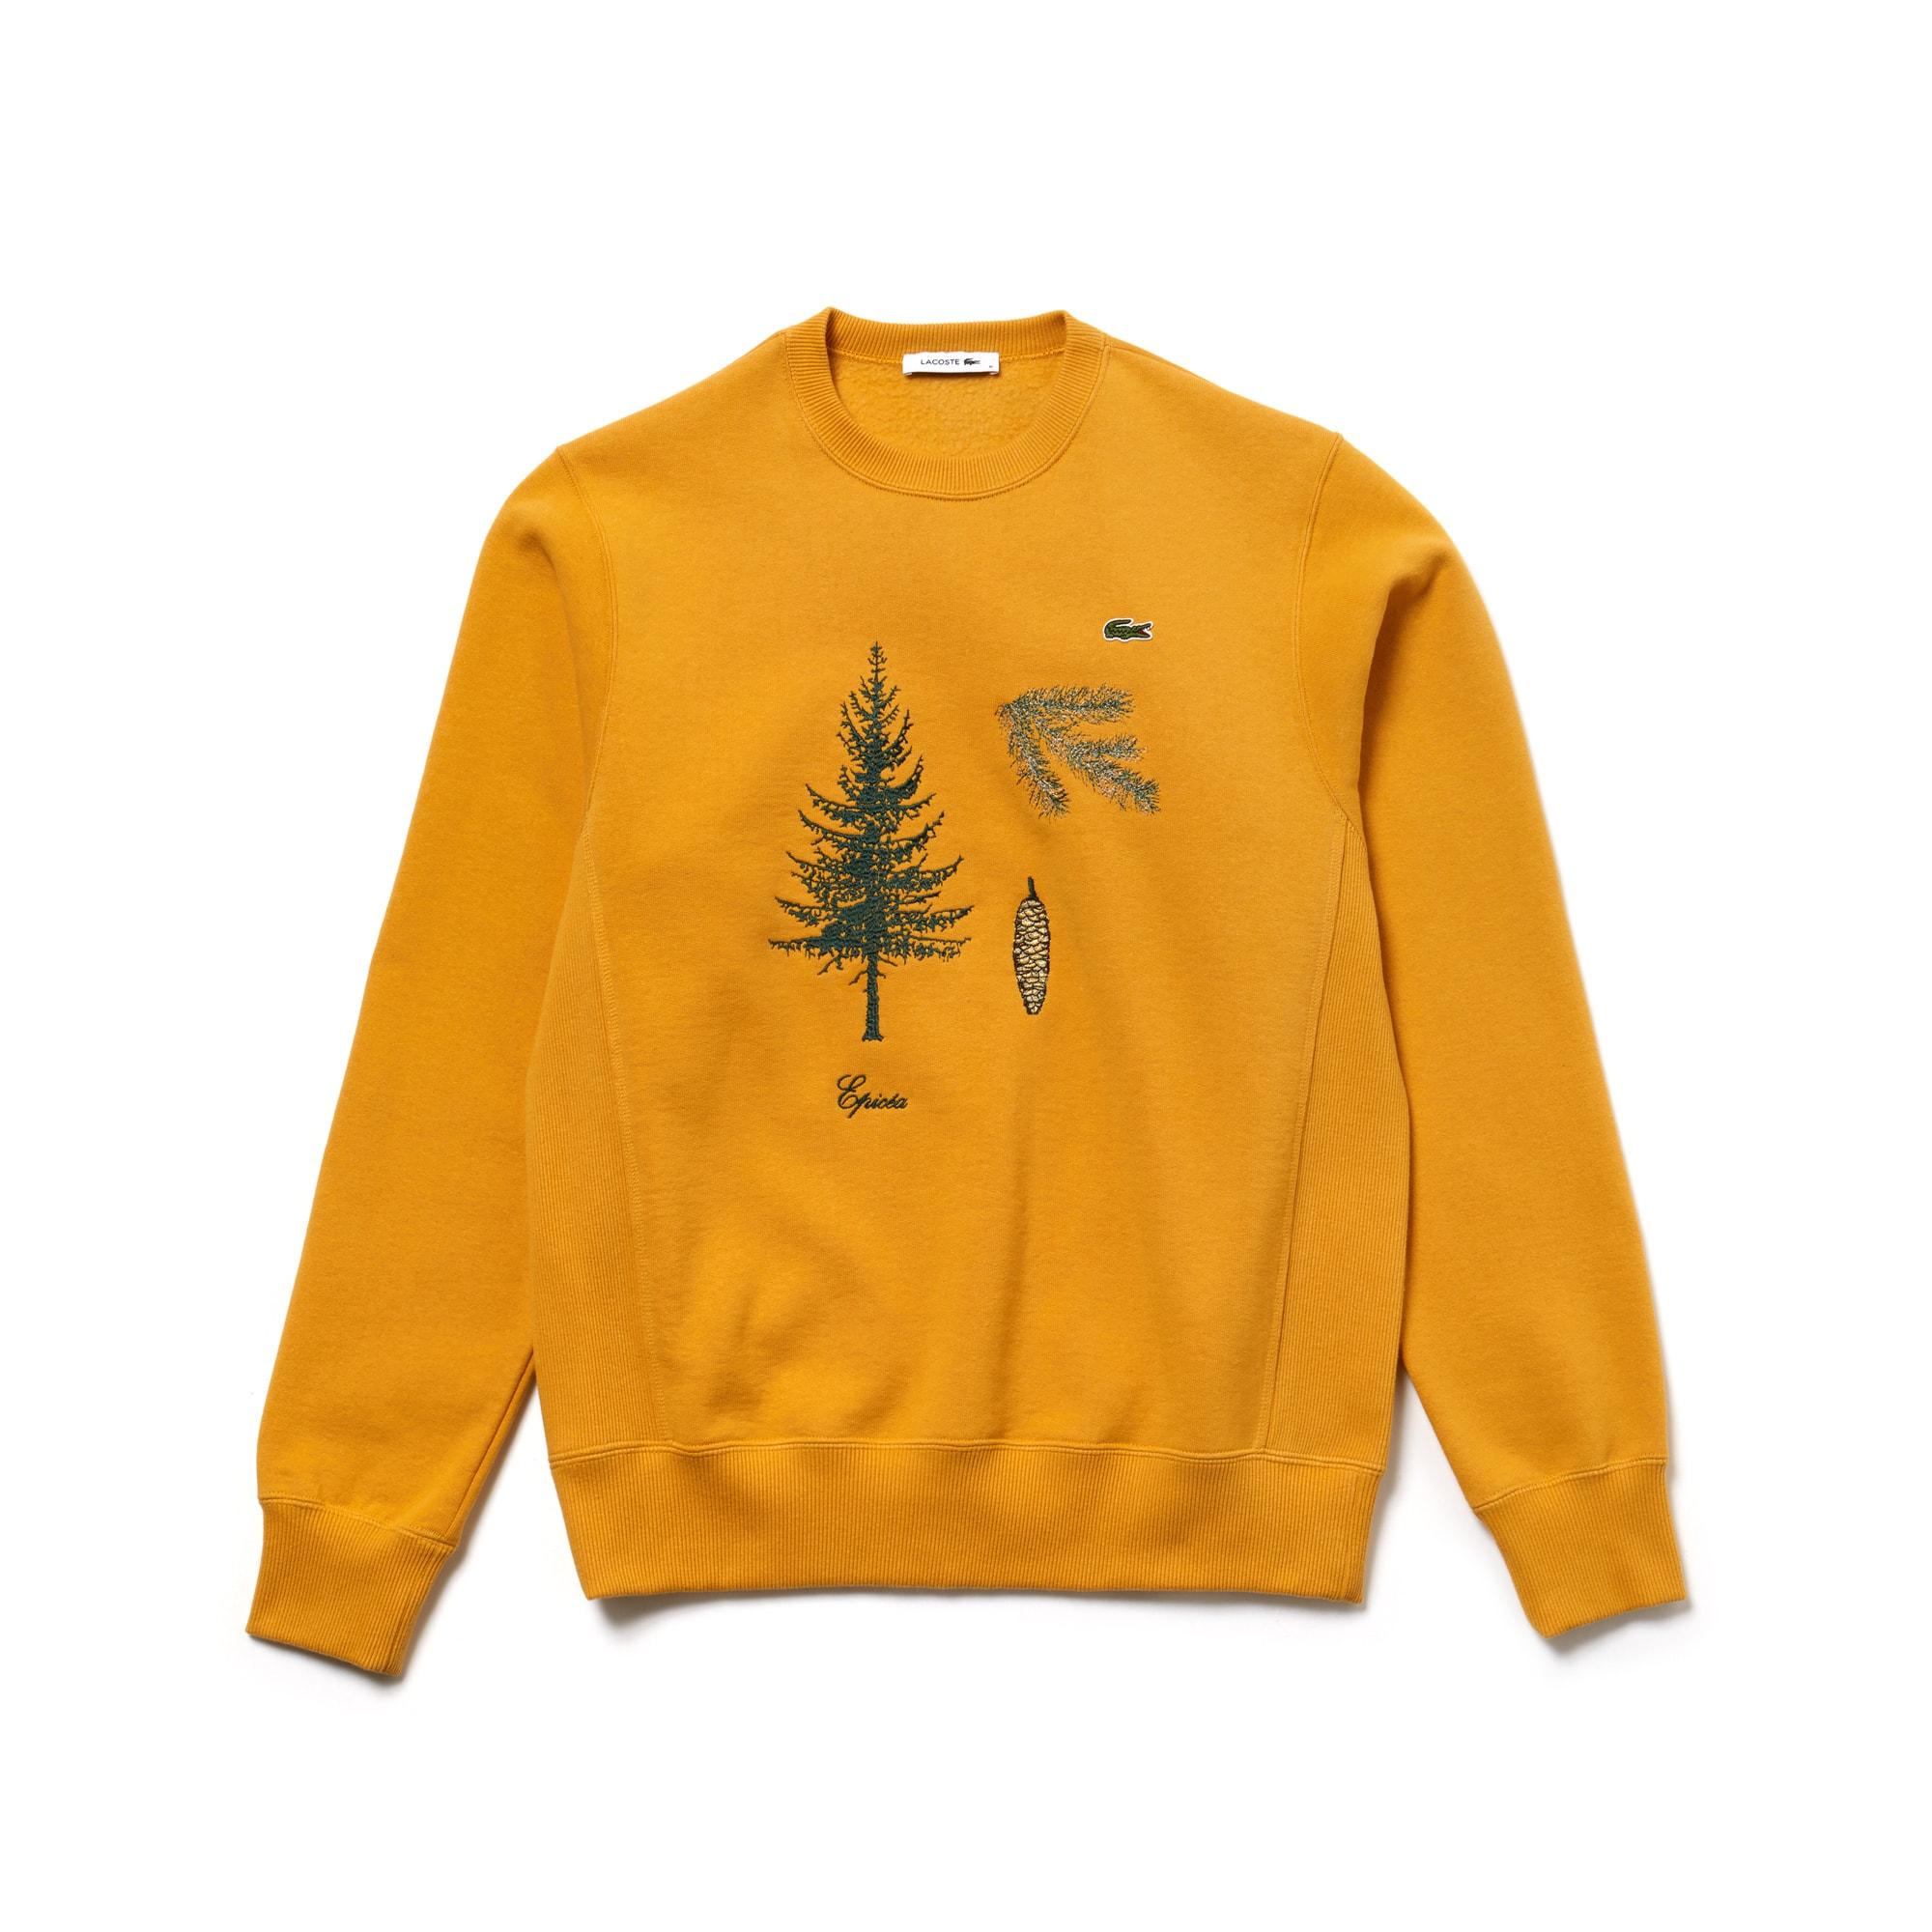 Unisex Fleece-Sweatshirt gestickt FASHION SHOW